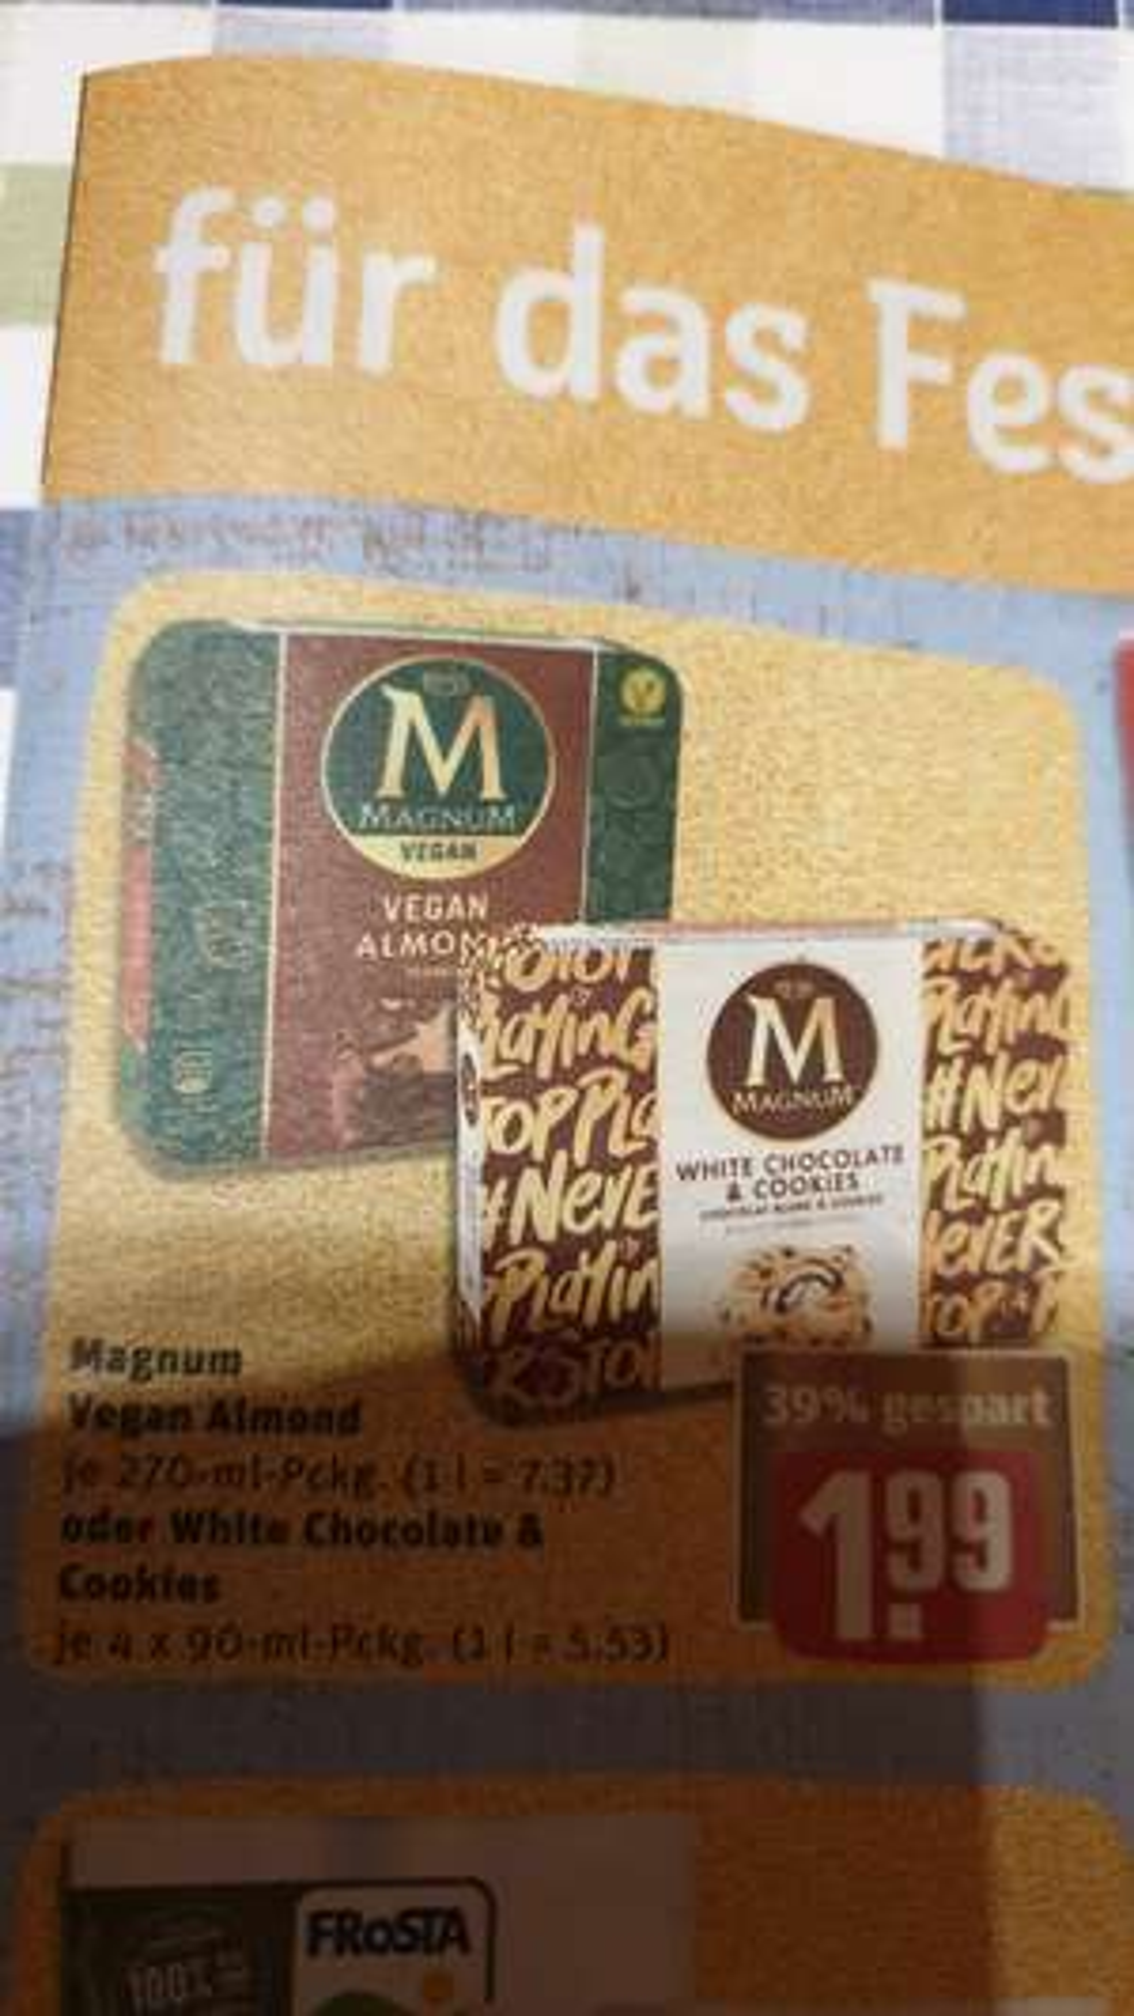 [Rewe] Magnum Vegan Almond / White Chocolate&Cookies